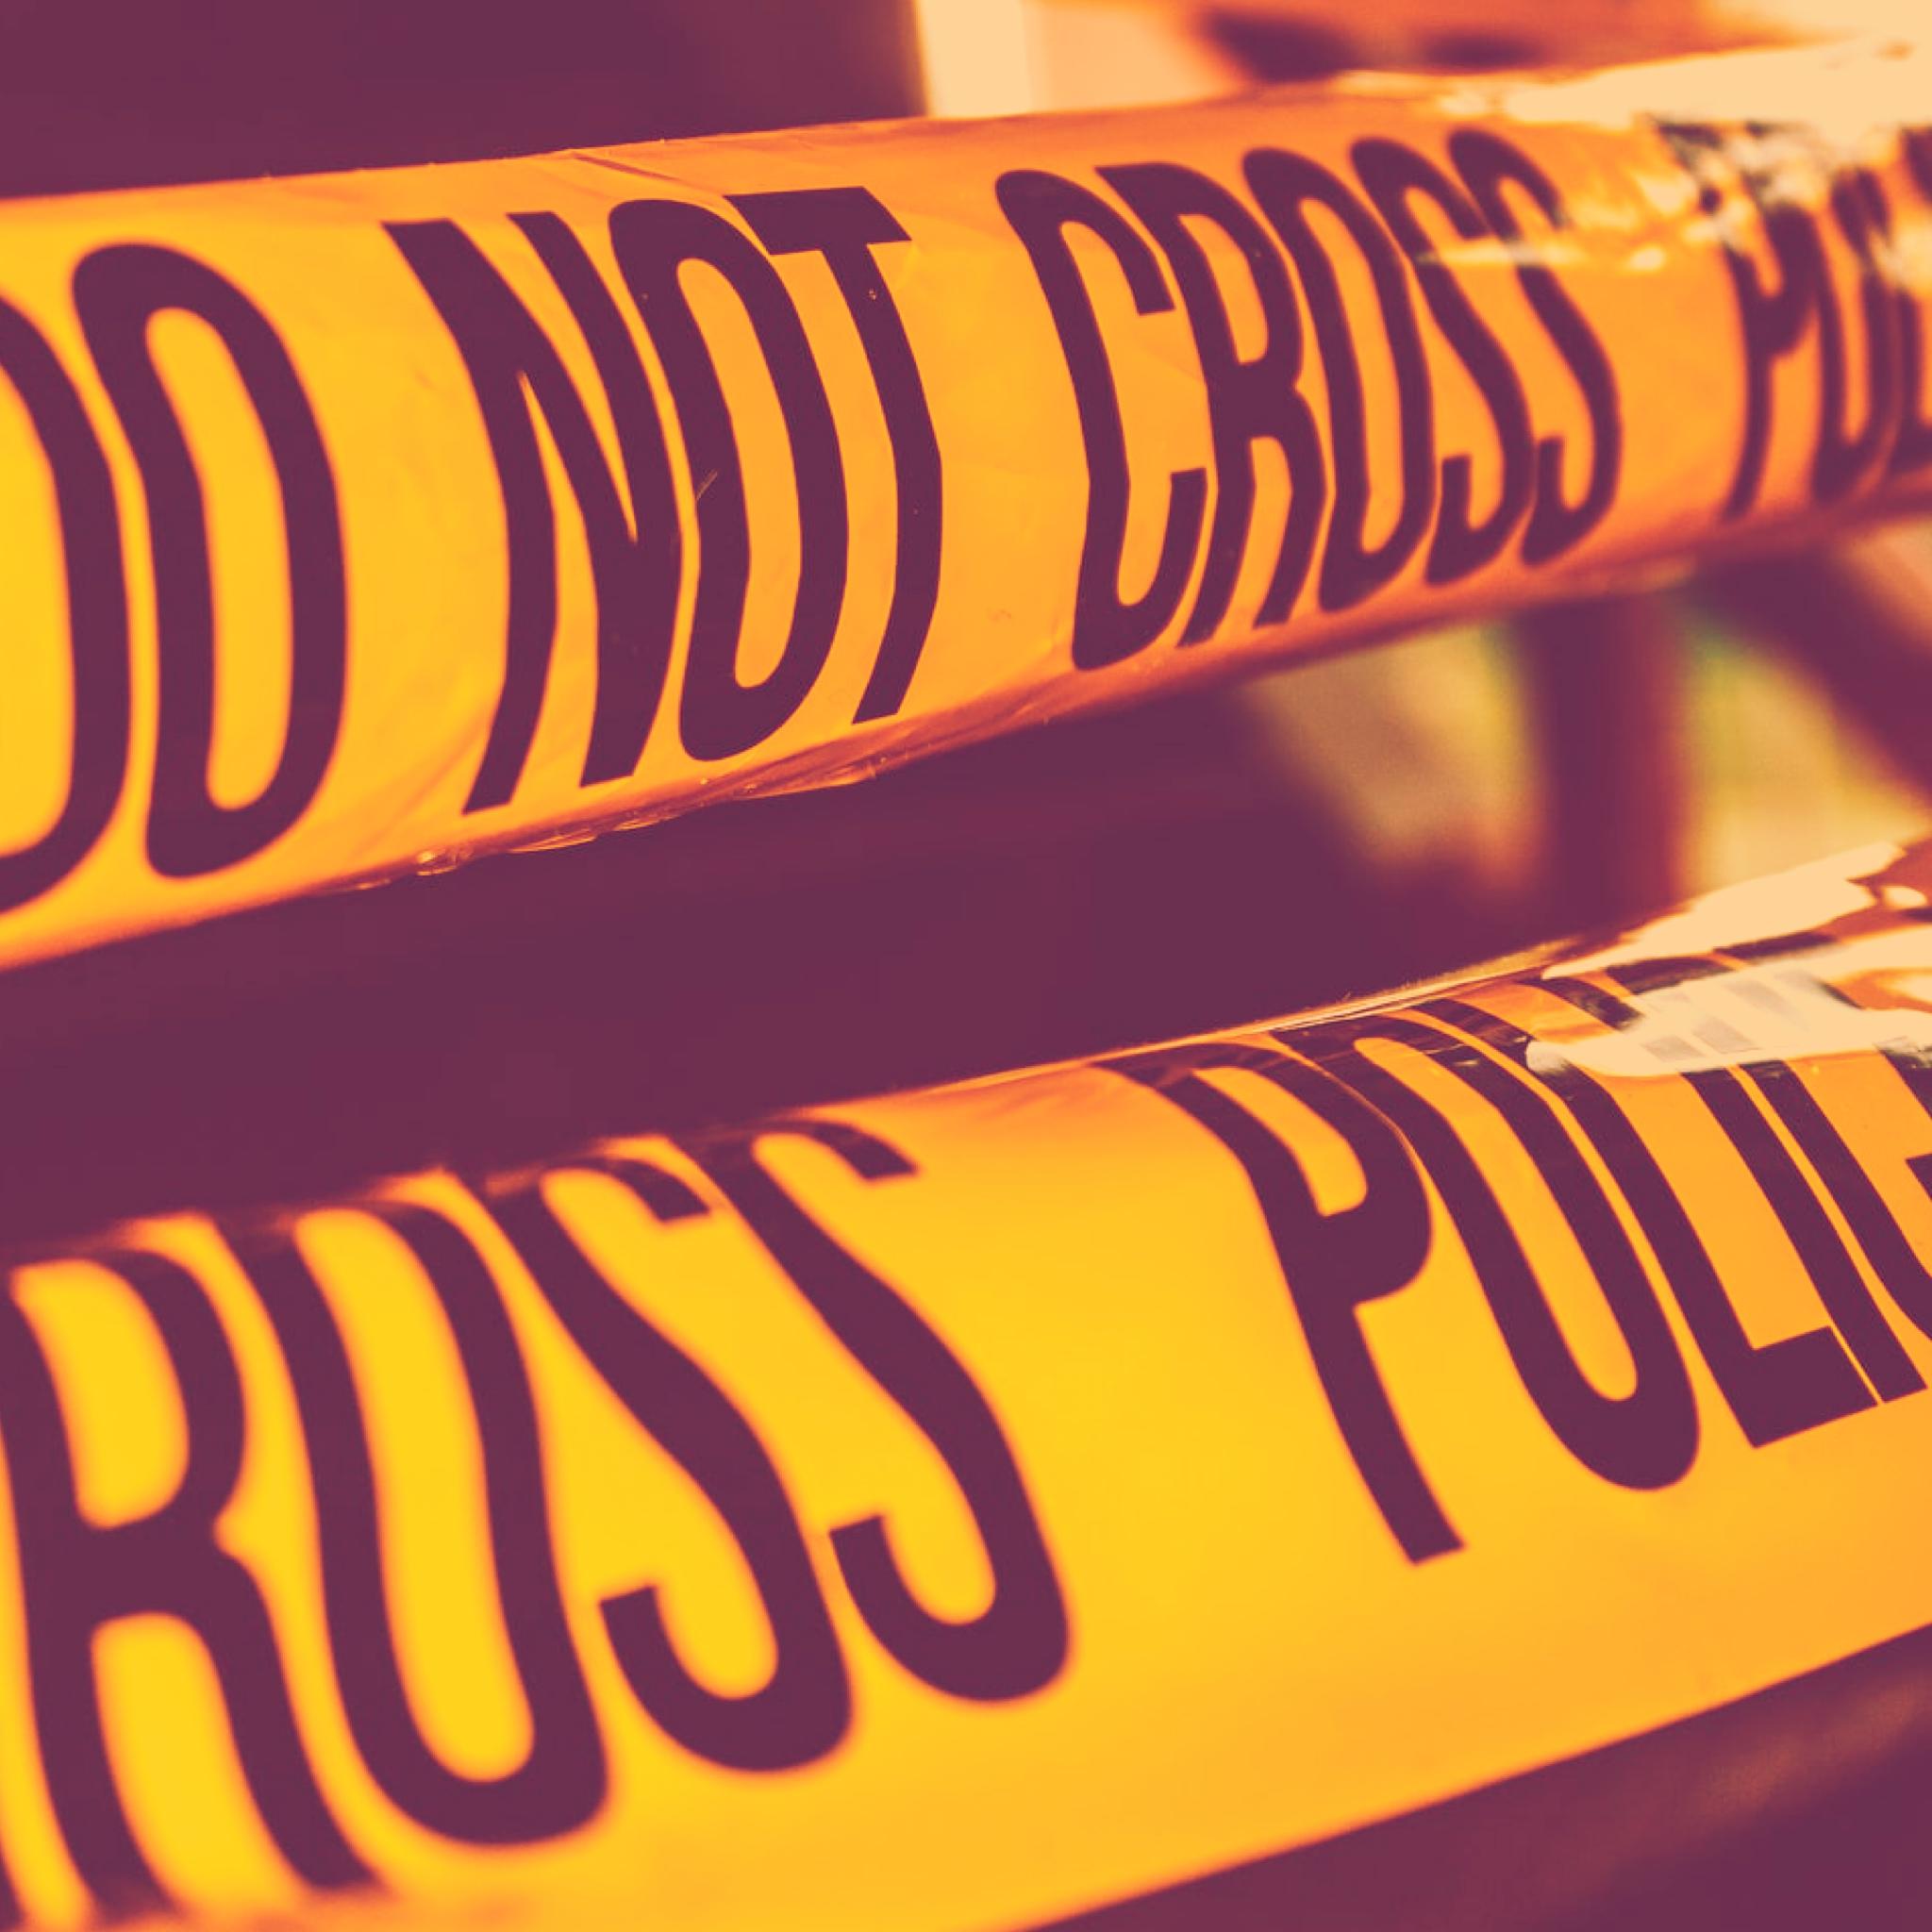 Waargebeurde misdaad / true crime podcasts